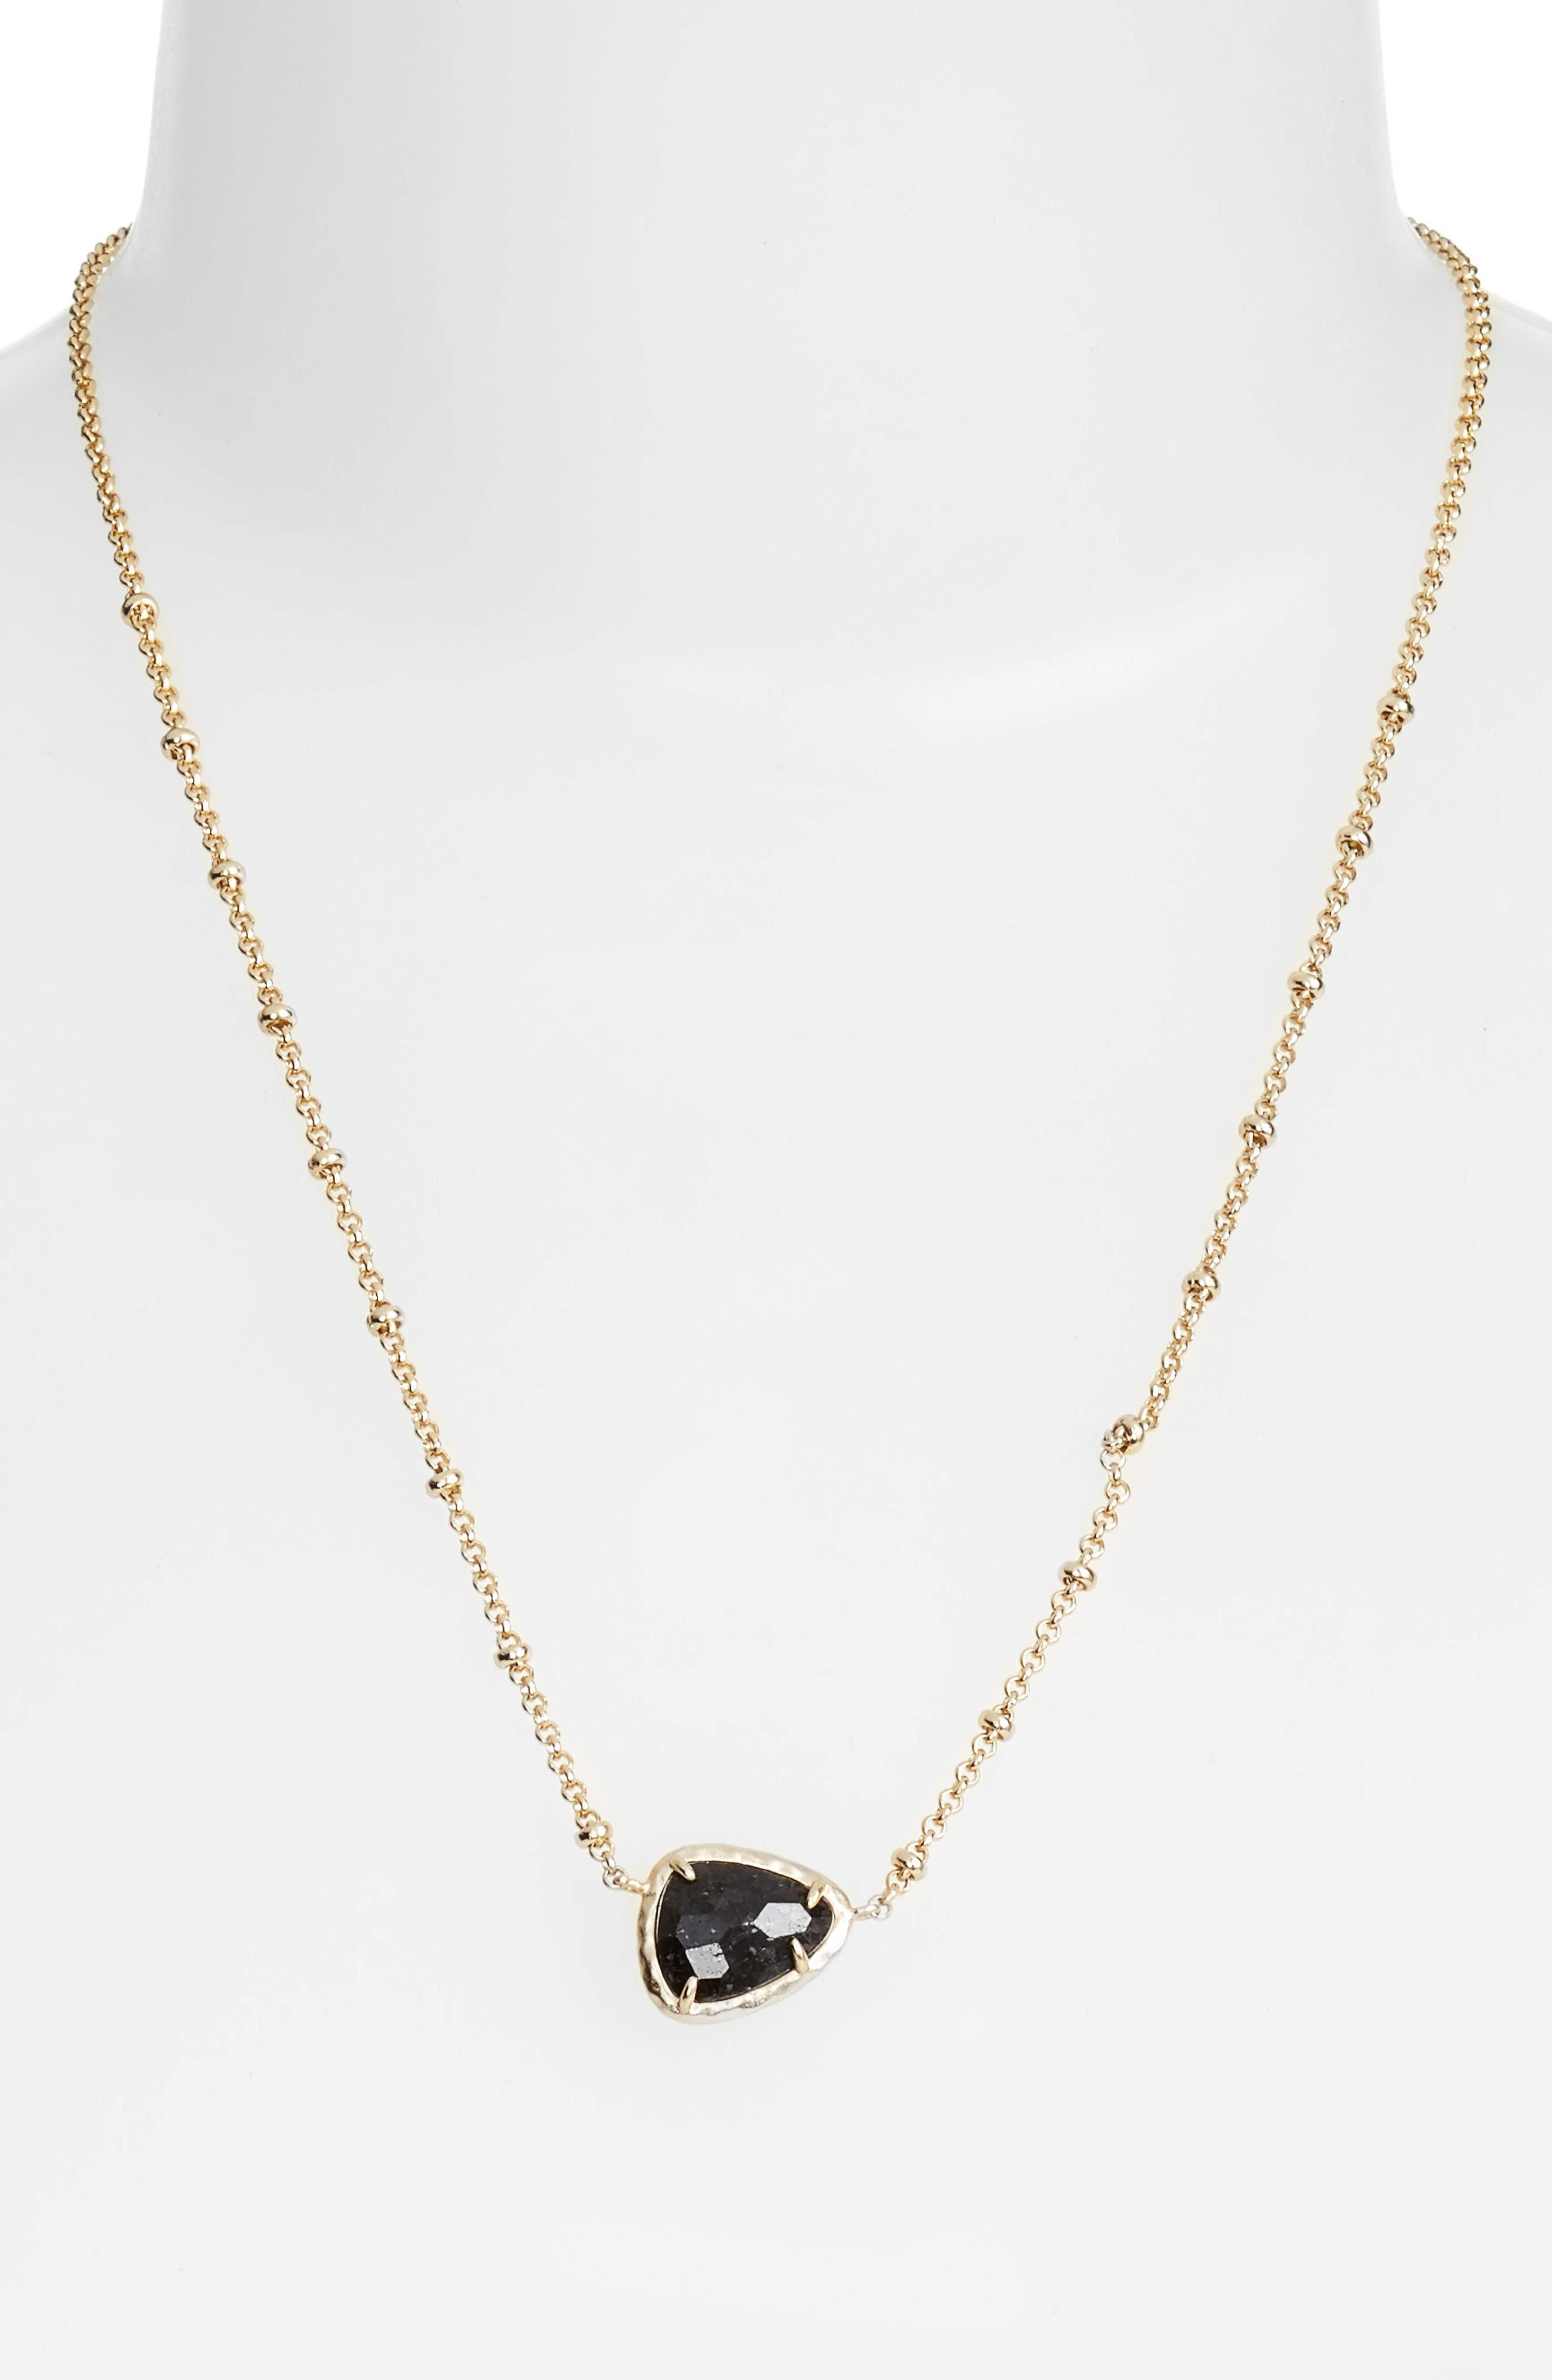 Main Image - Kendra Scott Arleen Pendant Necklace